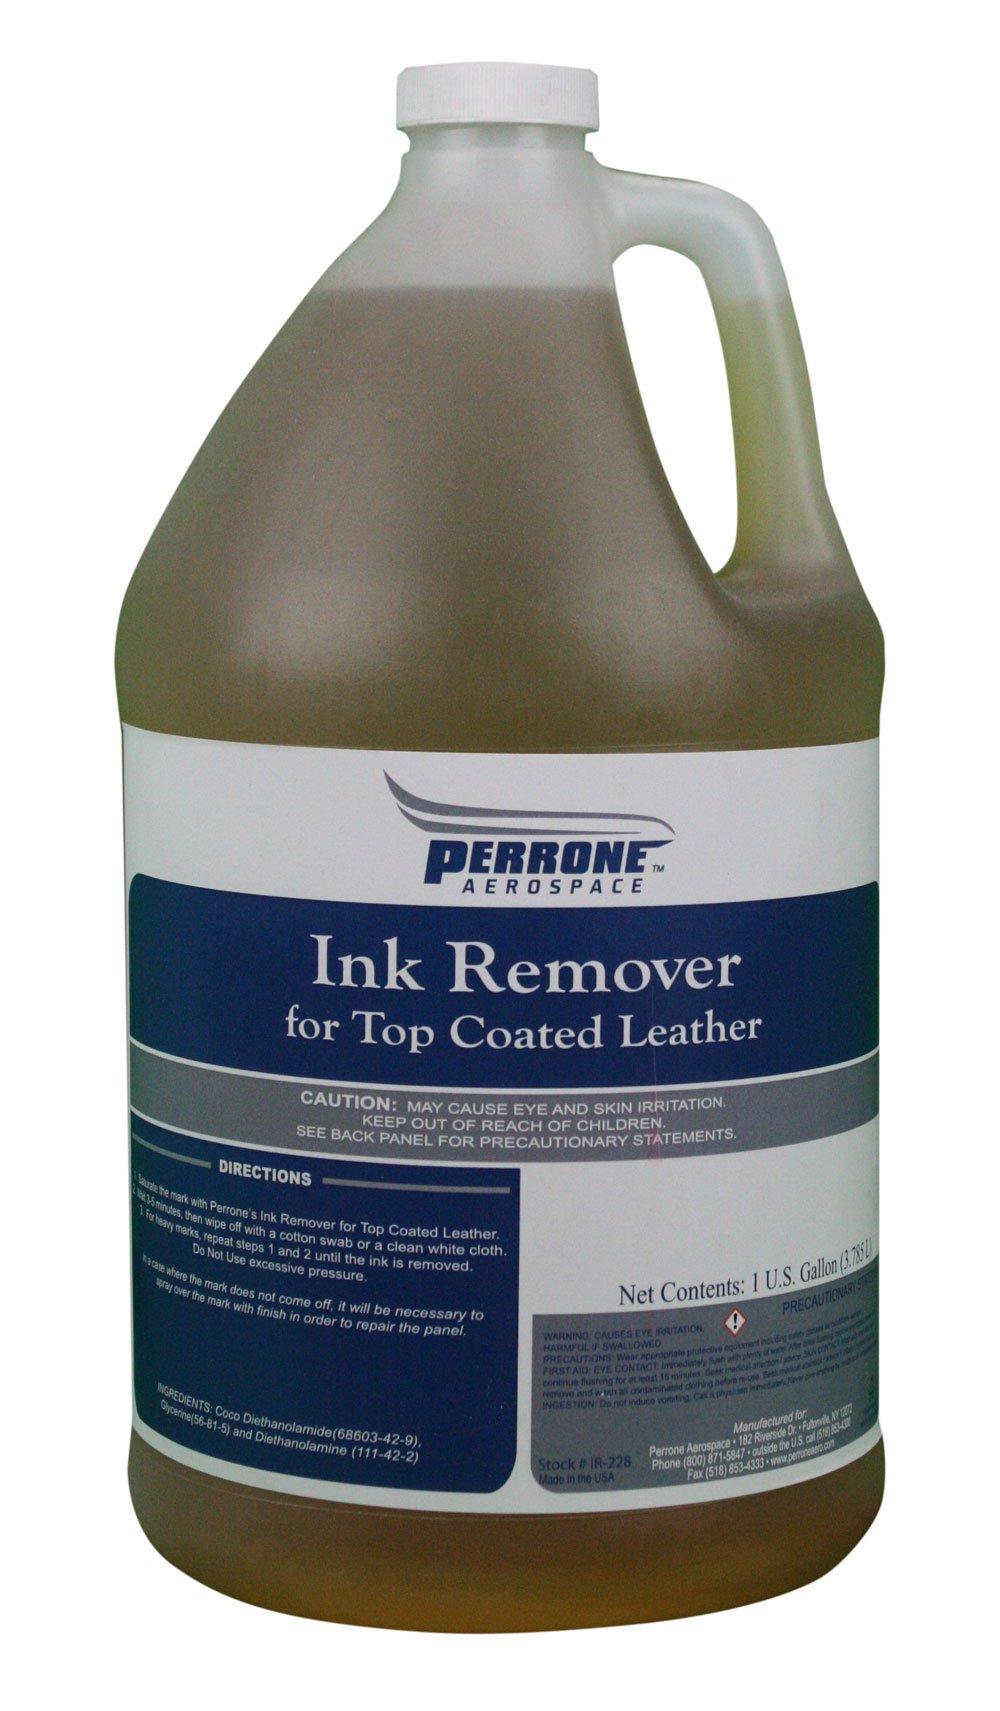 Perrone Aerospace IR-228 - Ink Remover - 1 gal. by Perrone Aerospace (Image #1)